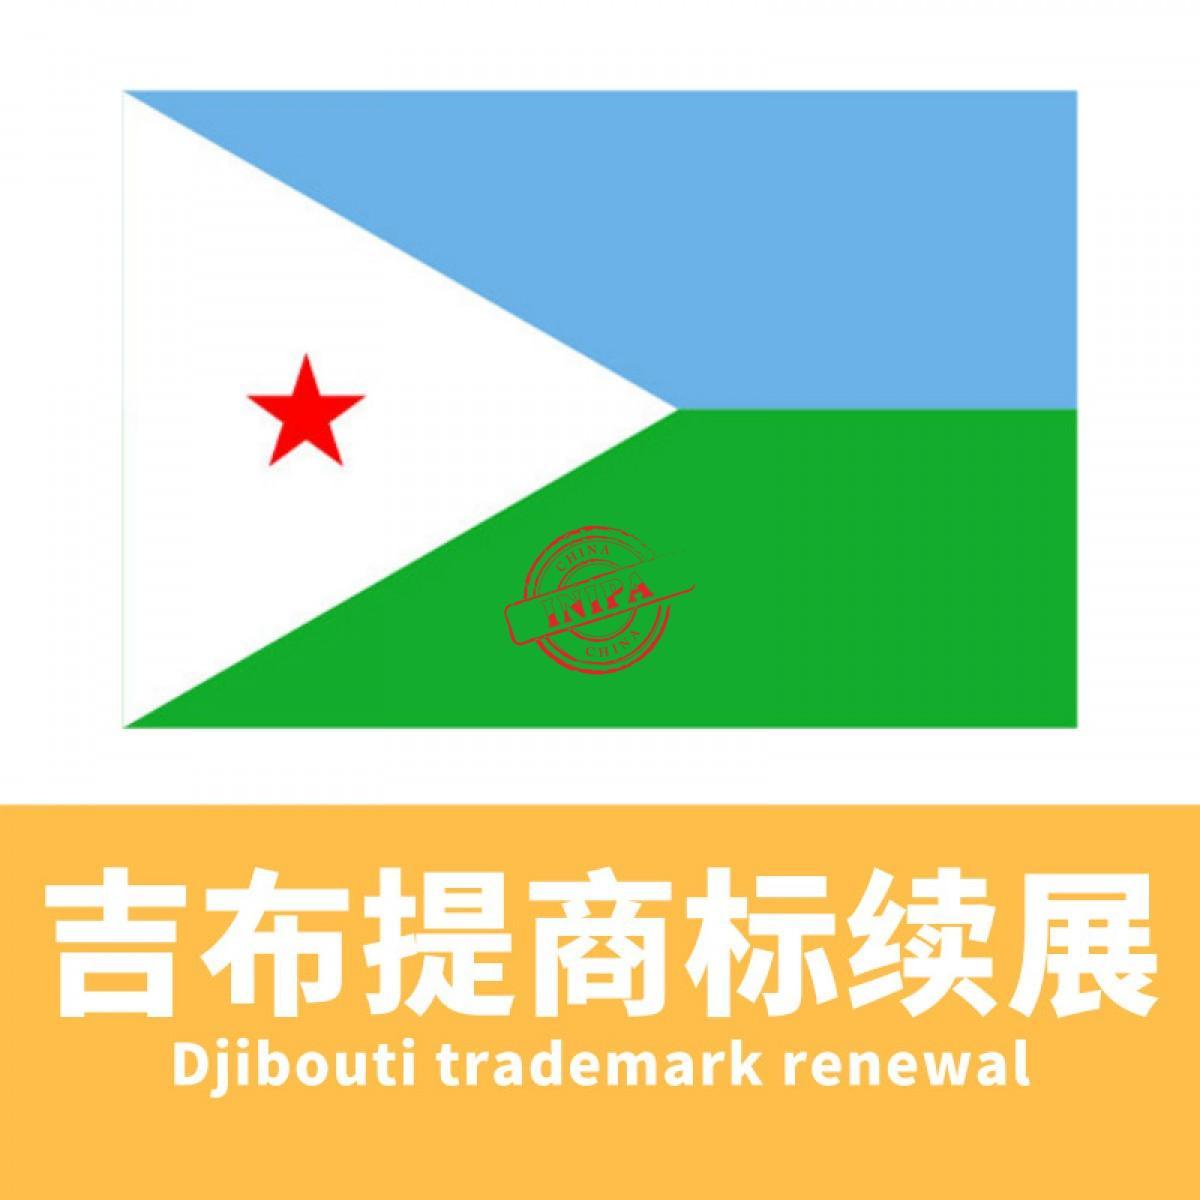 吉布提商标续展/Djibouti trademark renewal